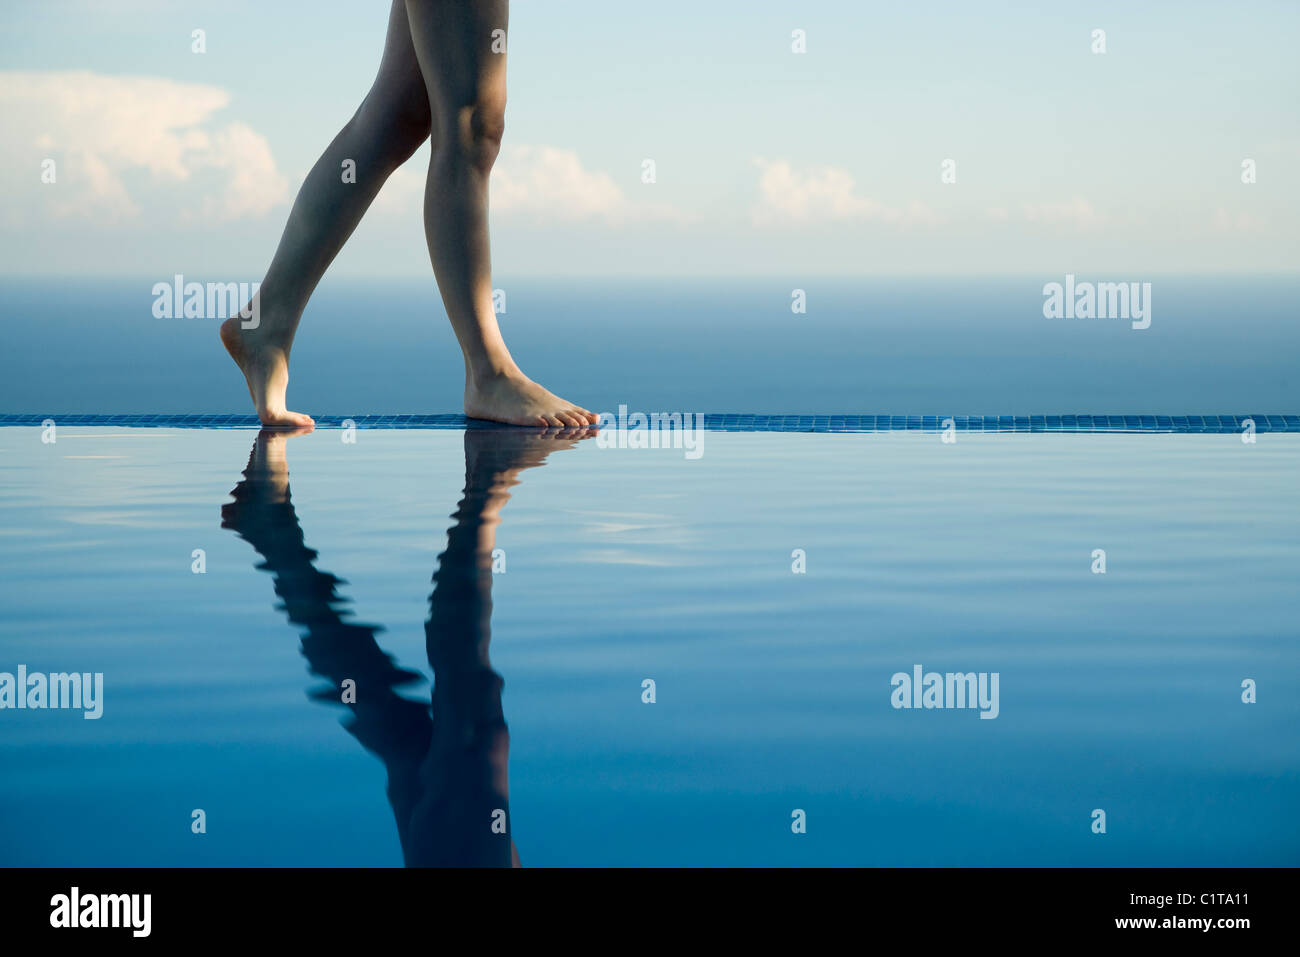 Woman walking along edge of infinity pool, low section - Stock Image